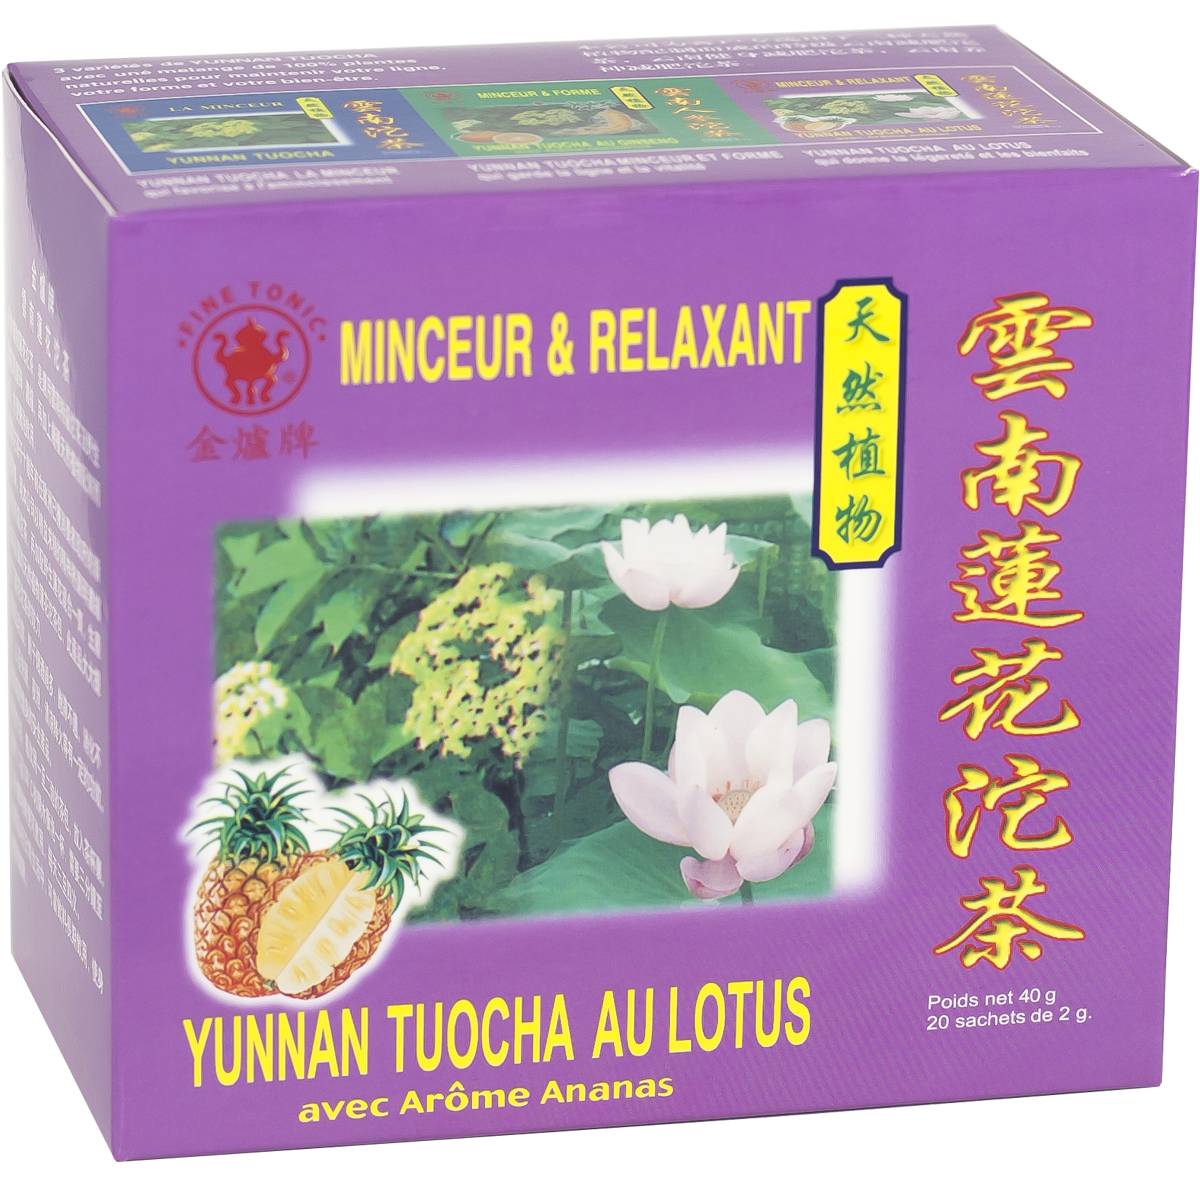 Yunnan Tuocha au Lotus - Minceur & Relaxant Image